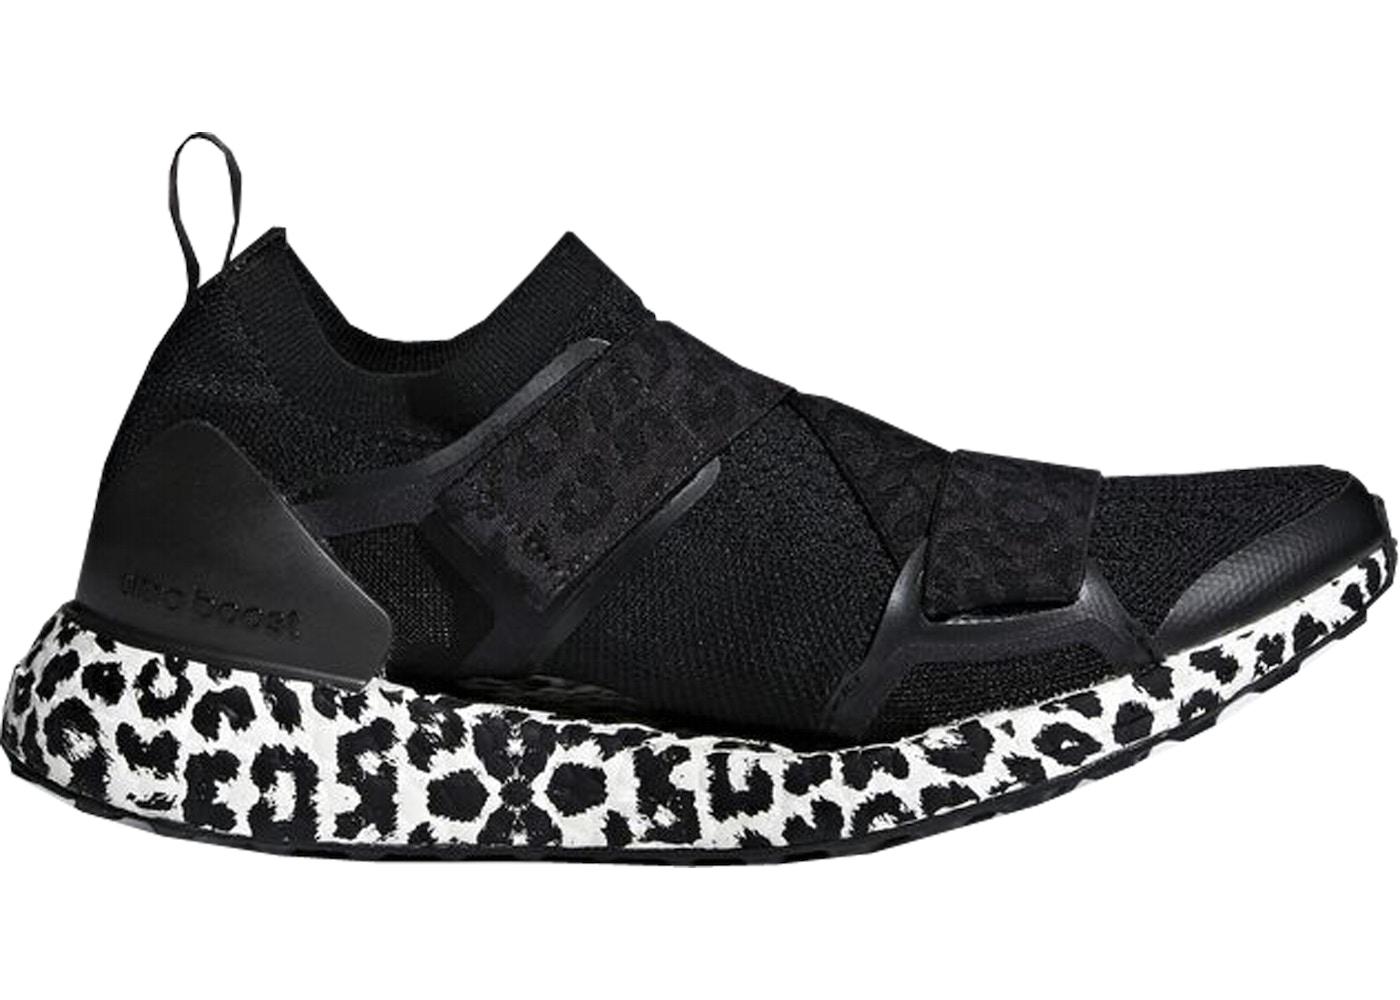 1664e5d0 Sell. or Ask. Size: 8.5W. View All Bids. adidas Ultra Boost X Stella  McCartney Black Leopard ...